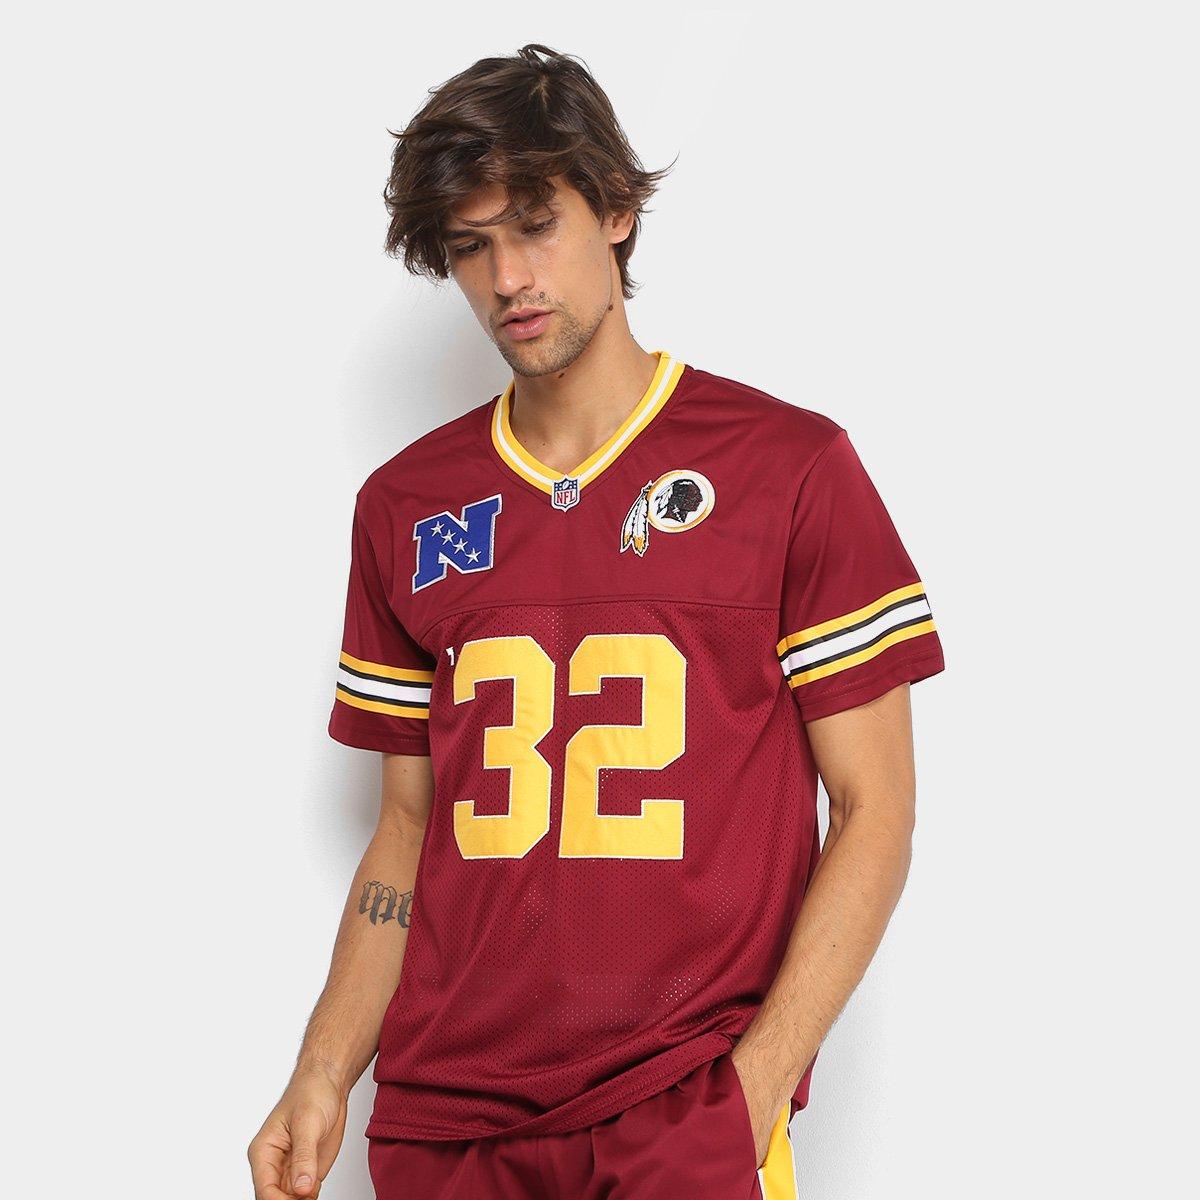 191e3f65e6 Camiseta NFL Washington Redskins New Era Sports Vein Year Masculina ...